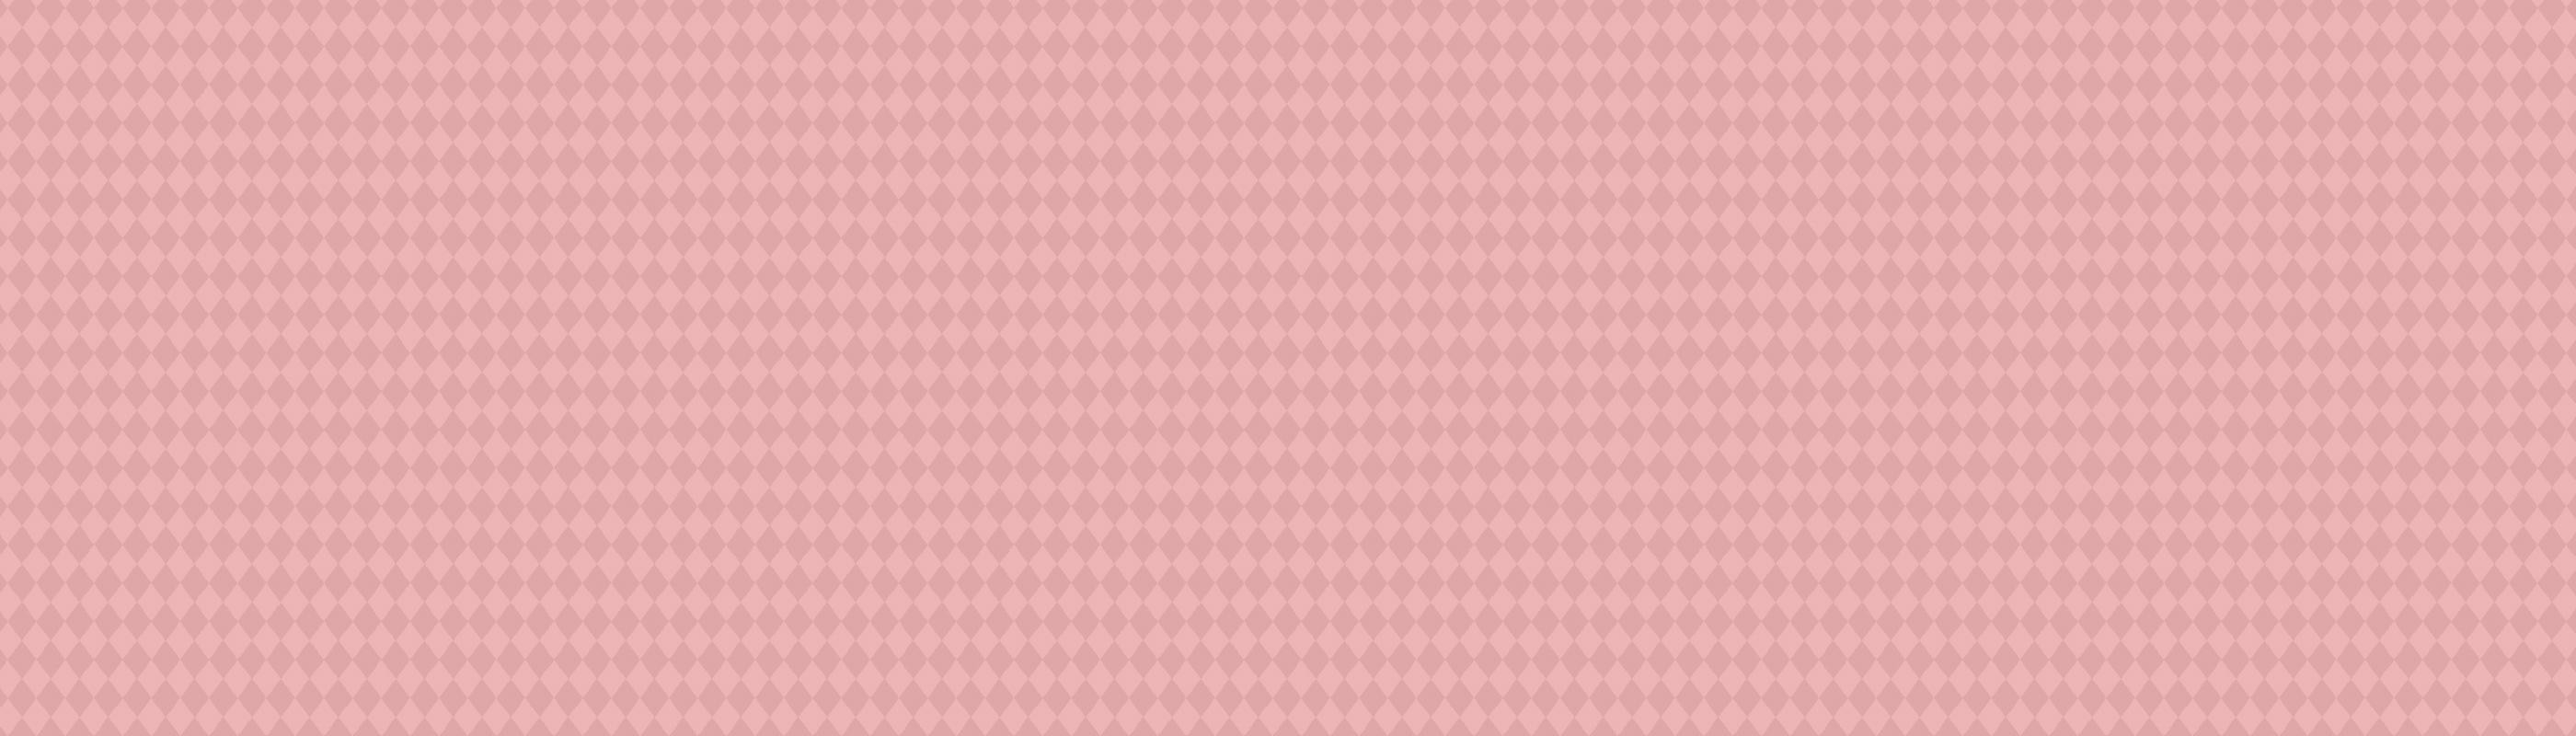 BG-ruitjes-Roze